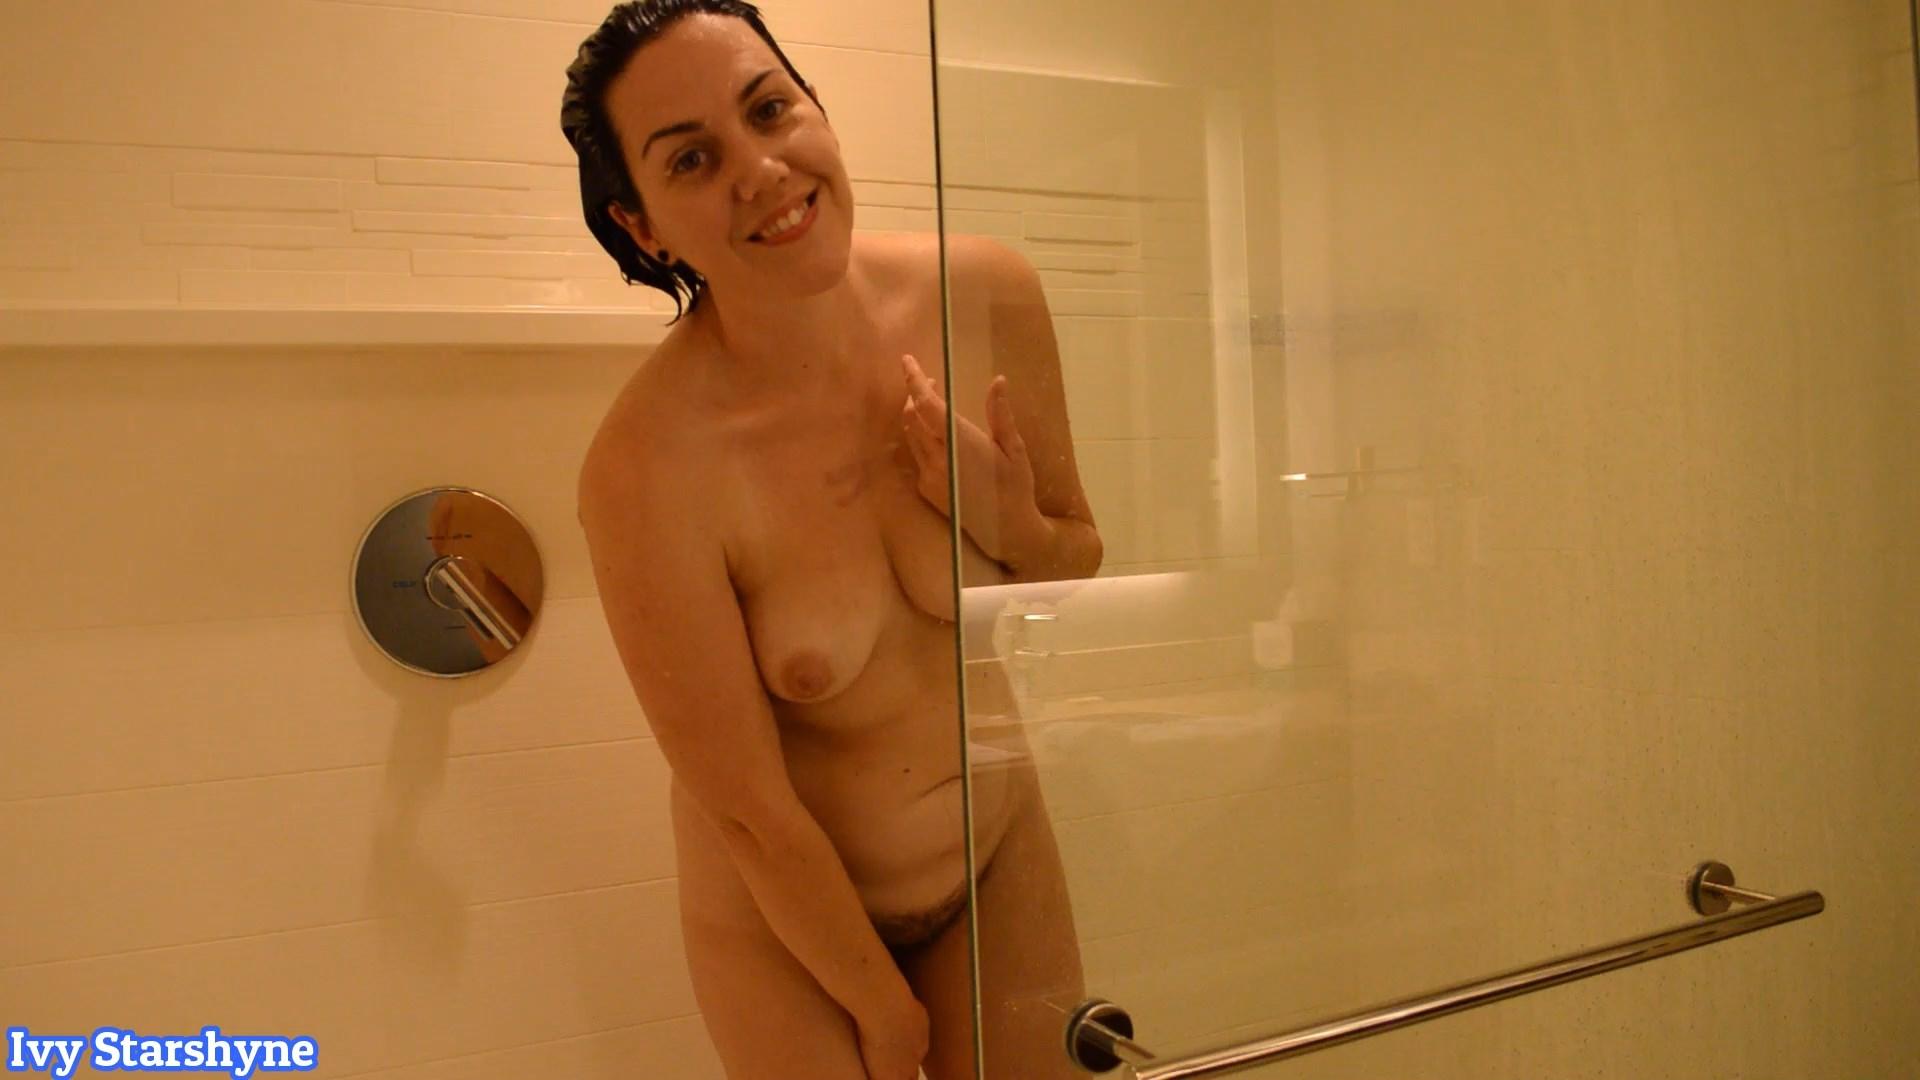 Ivy Starshyne - Mom In The Shower